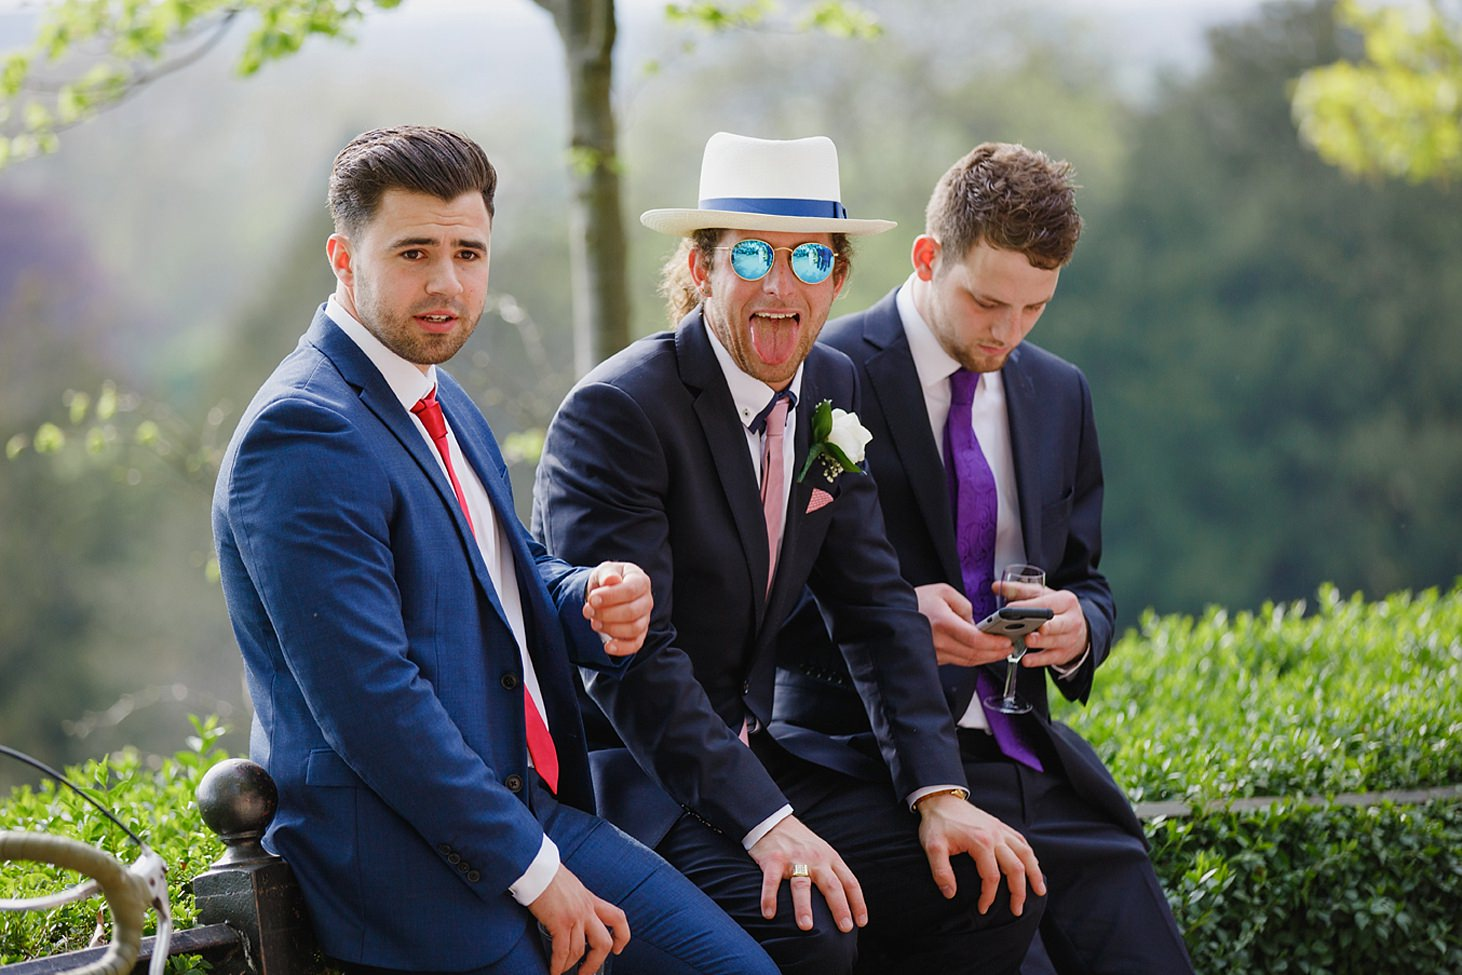 richmond hill wedding photography guest portrait